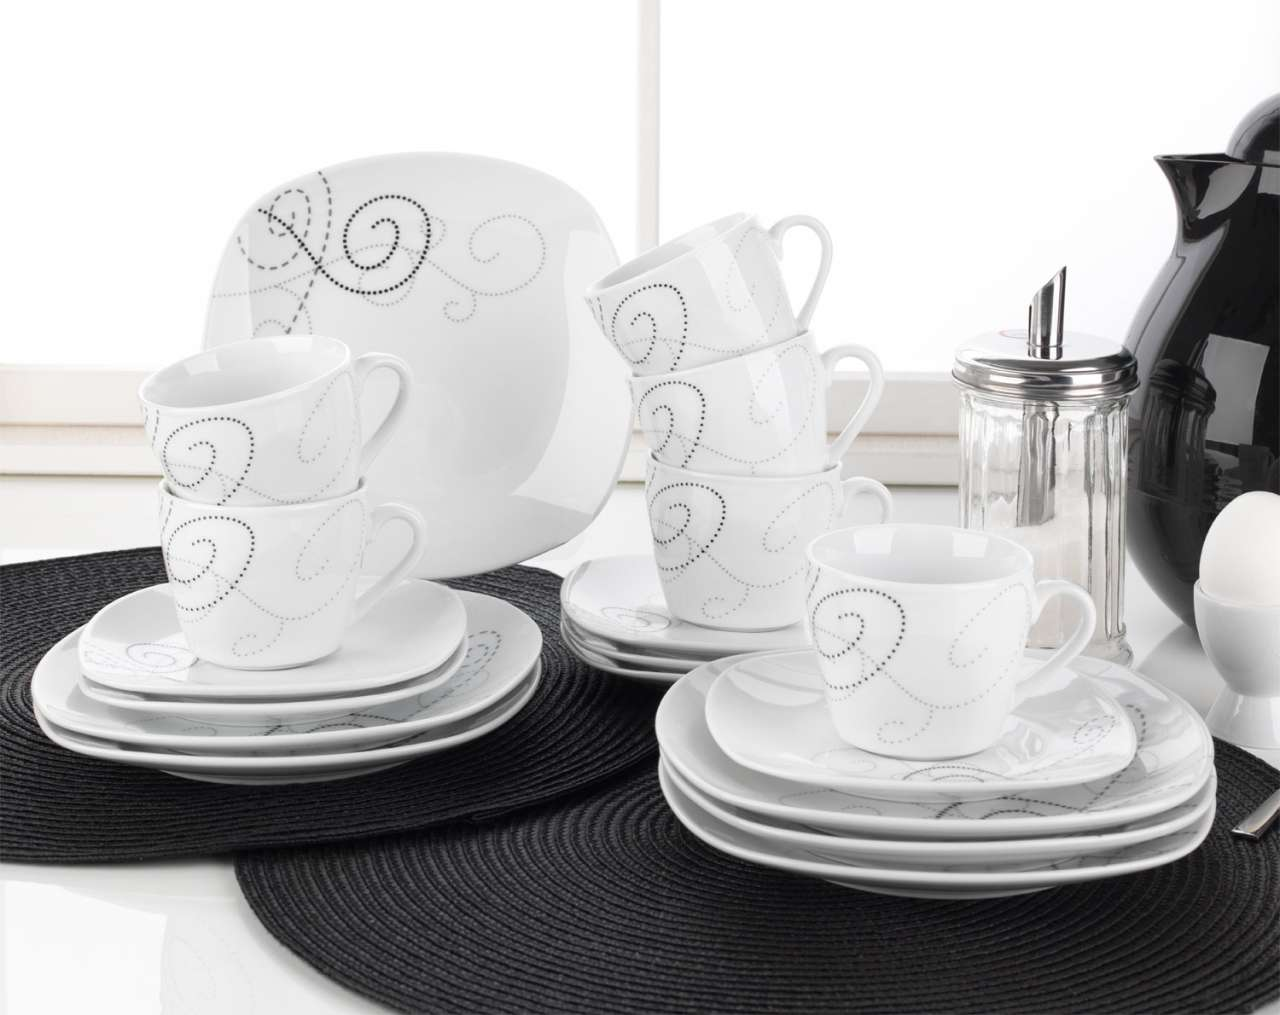 moebel-jack.de Kaffeeservice 18tlg. ANGELO, Weiß mit Dekor Schwarz/Grau